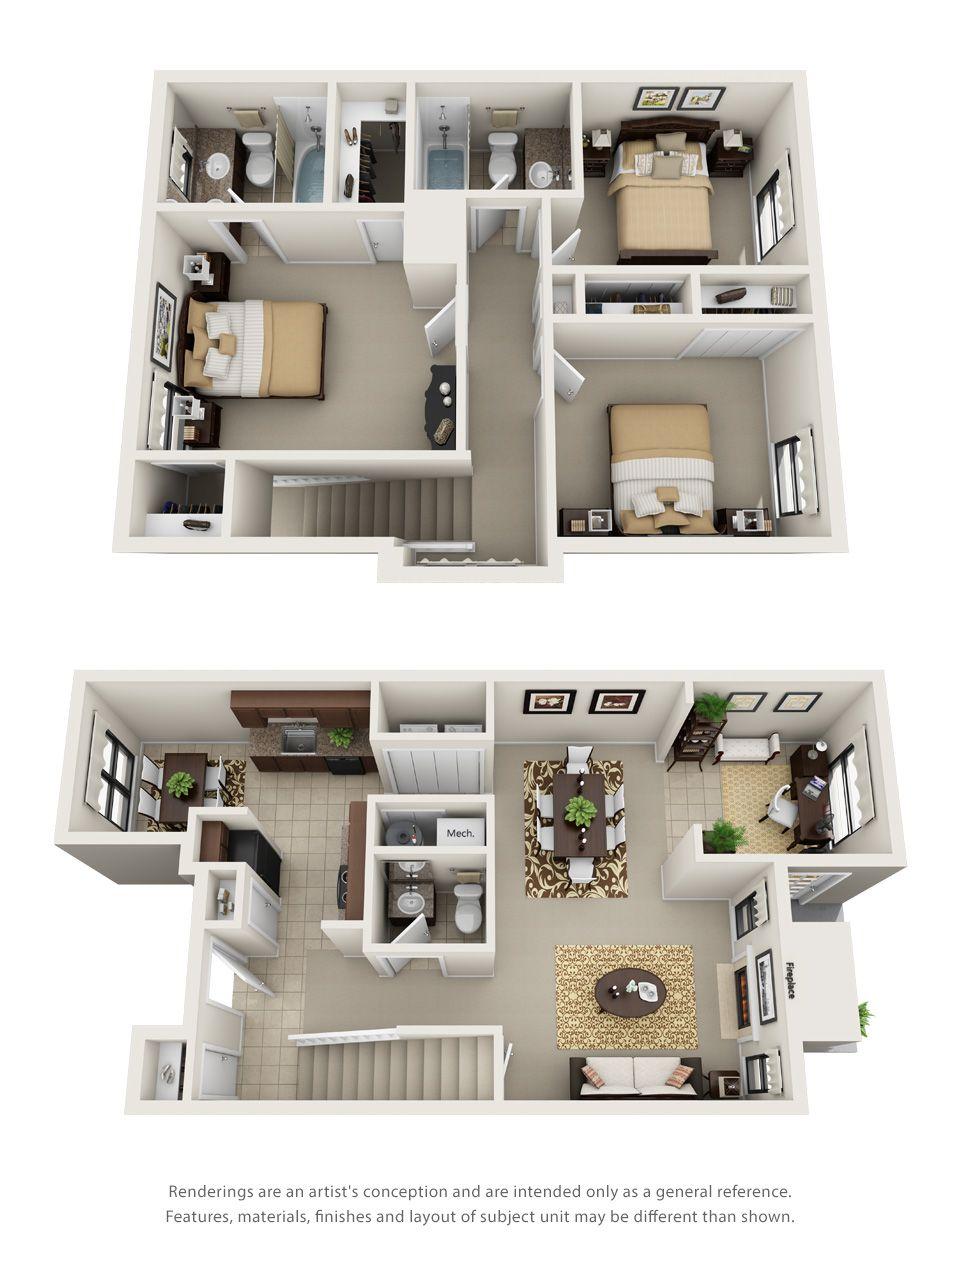 1 2 3 Bedroom Apartments In Hoover Al Floor Plans Hoover Alabama Apartment Steadfast Apartment Layout One Bedroom House Apartment Design